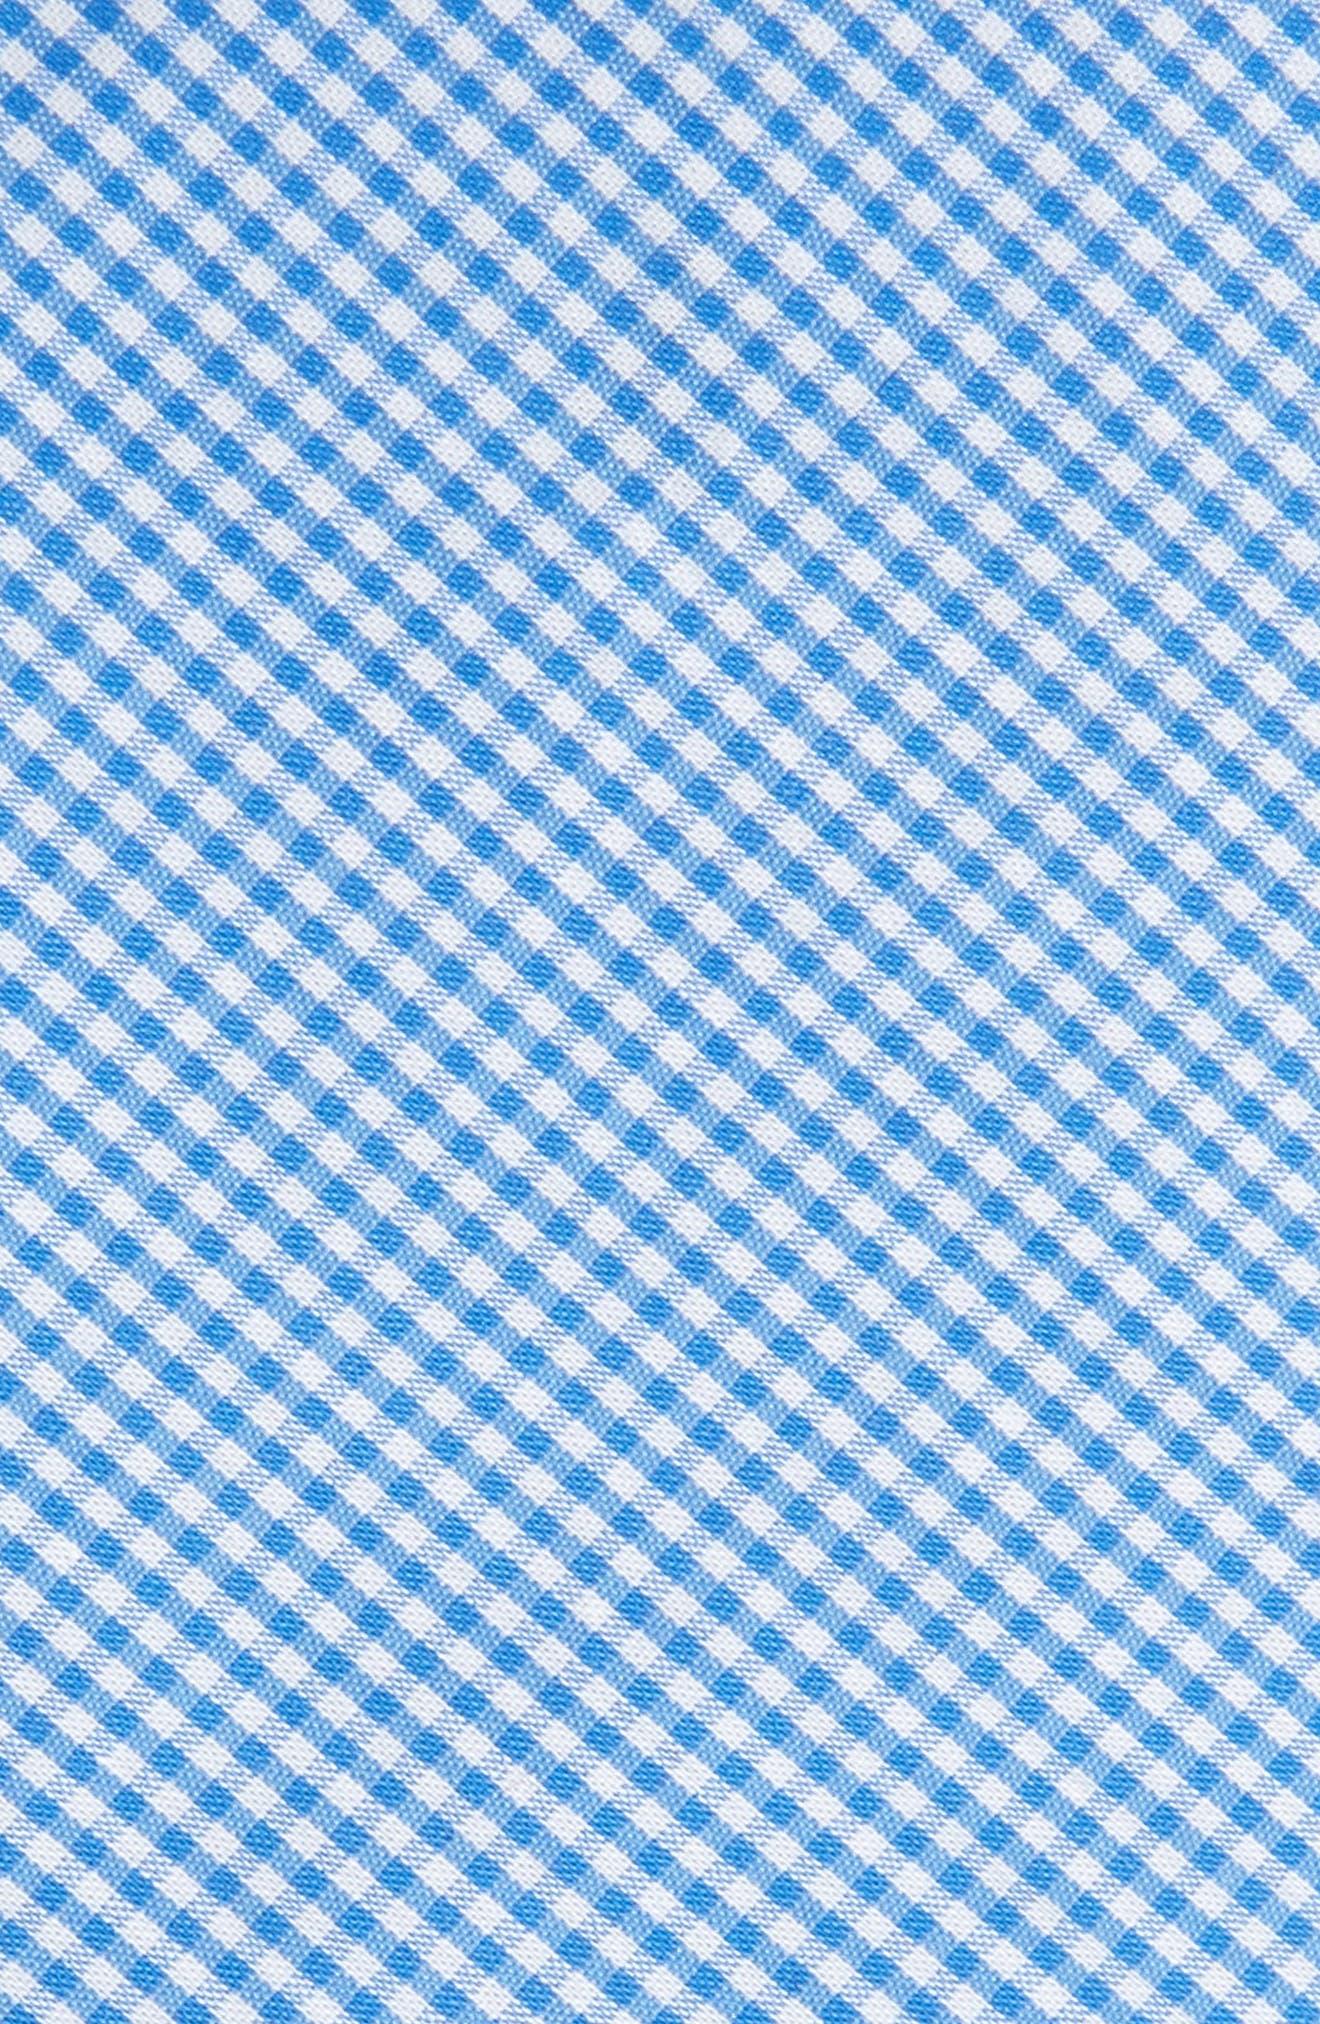 Sydney Check Cotton Skinny Tie,                             Alternate thumbnail 2, color,                             Light Blue